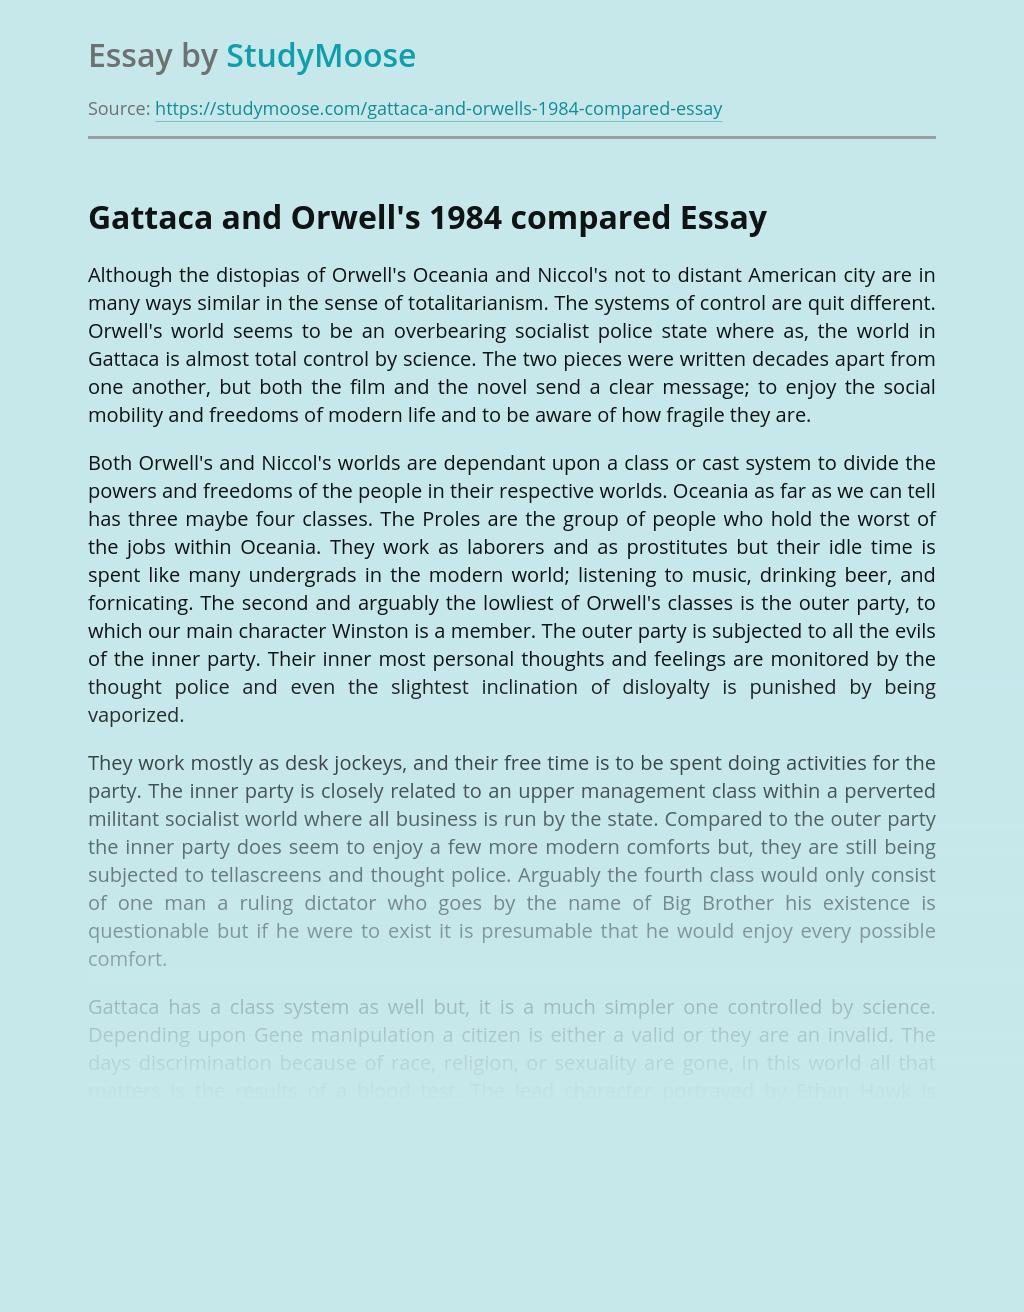 Gattaca and Orwell's 1984 compared